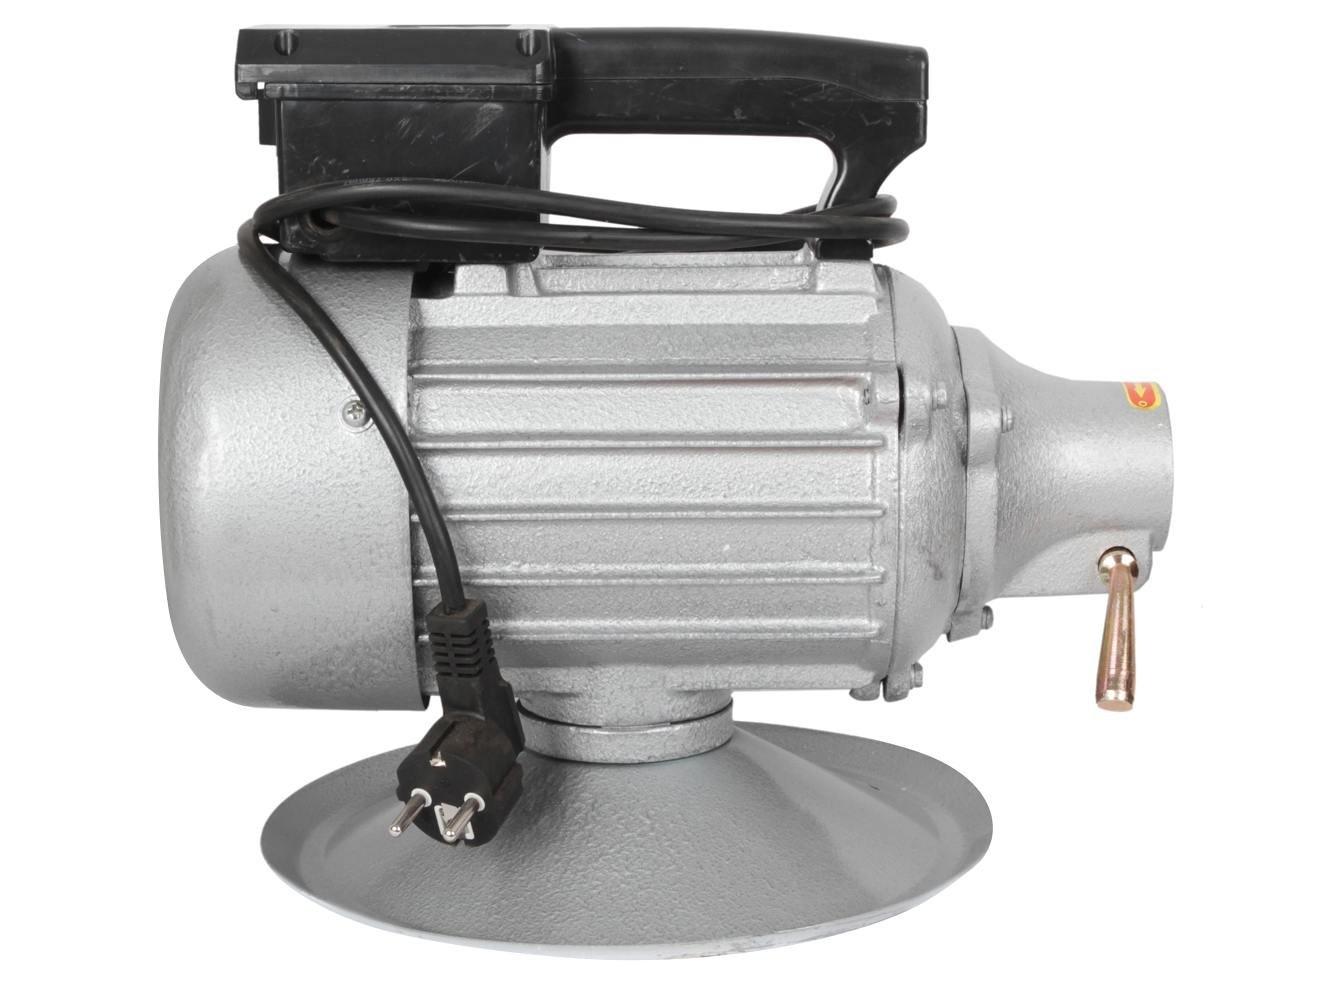 Varan Motors ZN70D45X6M ELEKTRO HANDR/ÜTTLER BETONR/ÜTTLER R/ÜTTELFLASCHE R/ÜTTLER 1500W 45MM 6M